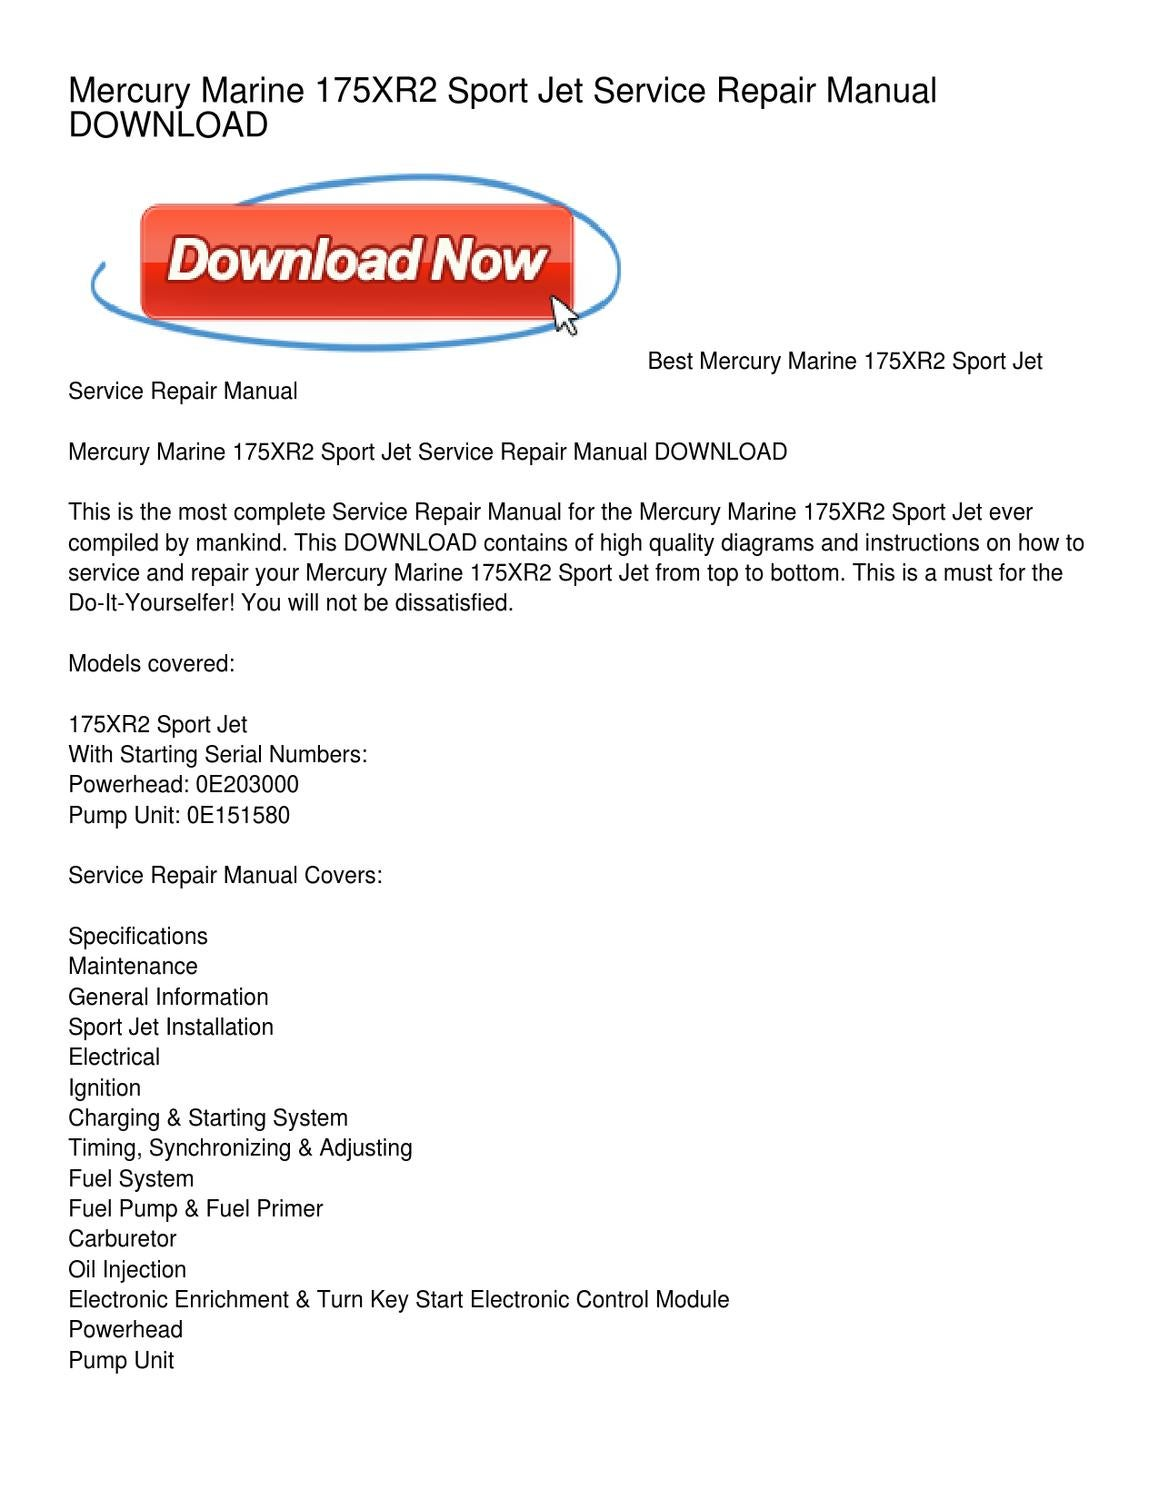 Mercury Marine 175XR2 Sport Jet Service Repair Manual DOWNLOAD by Polly  Arroyo - issuu